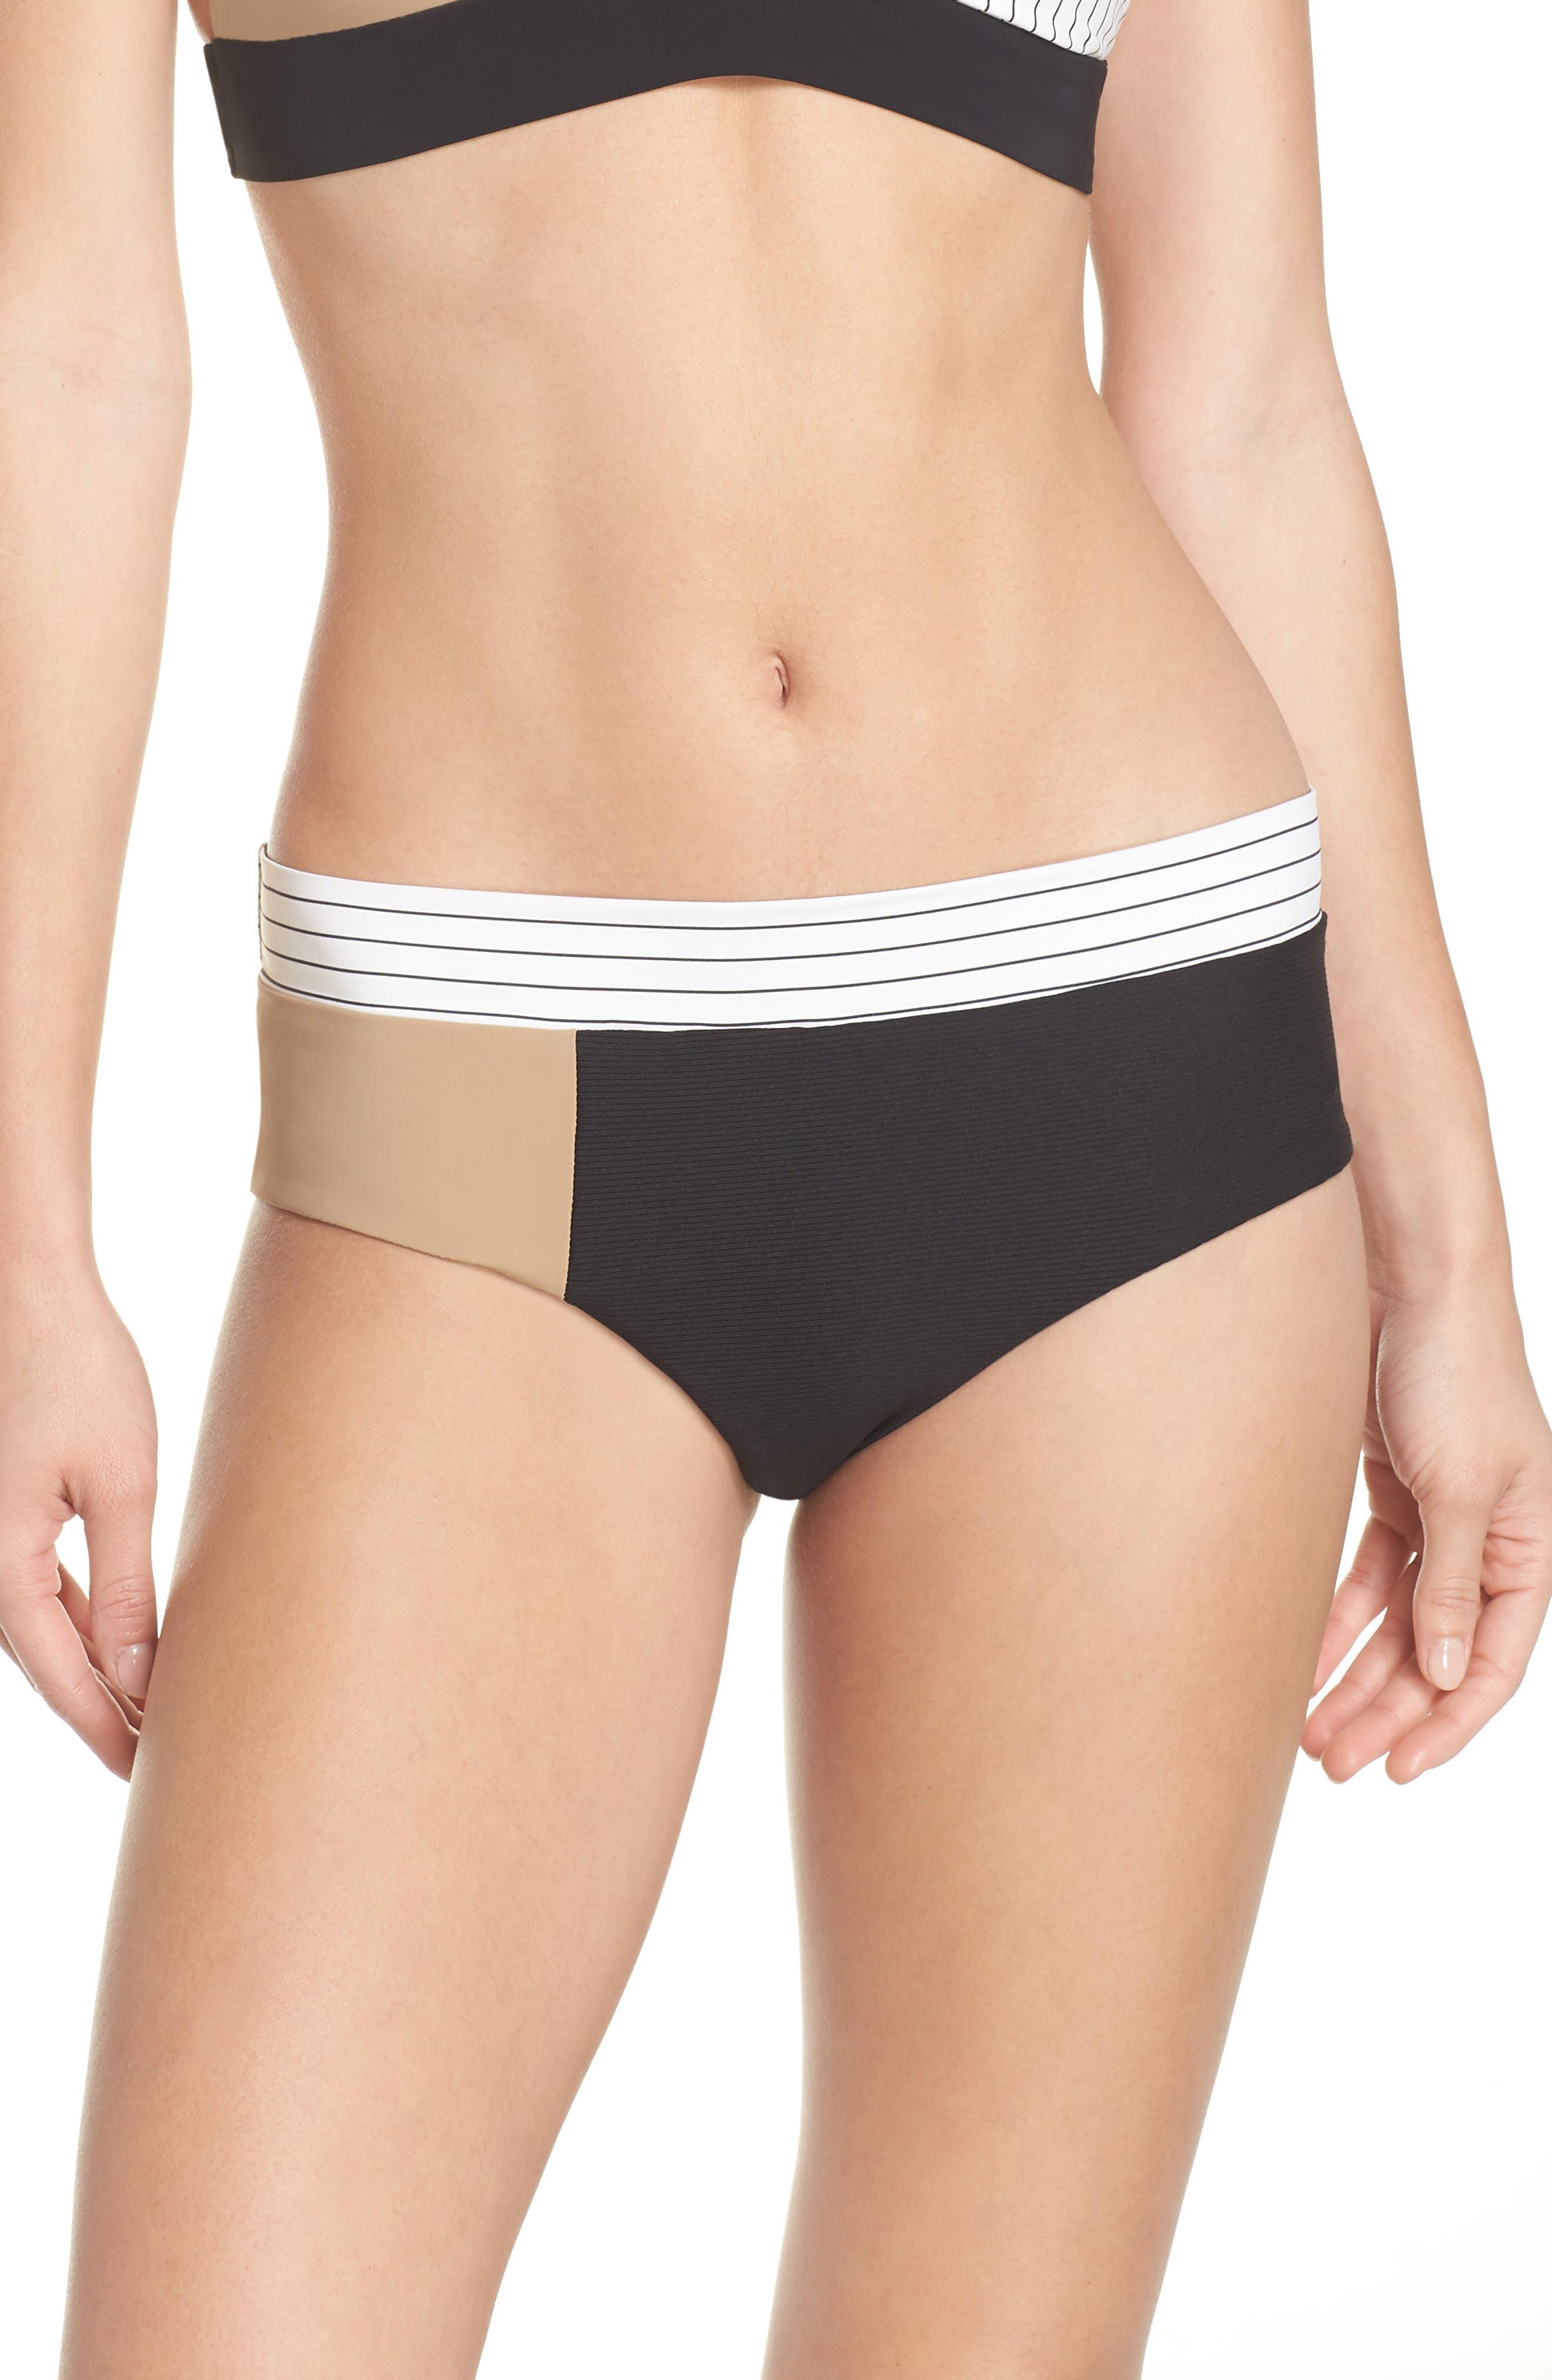 Makaveli Bikini Bottoms,                             Main thumbnail 1, color,                             250